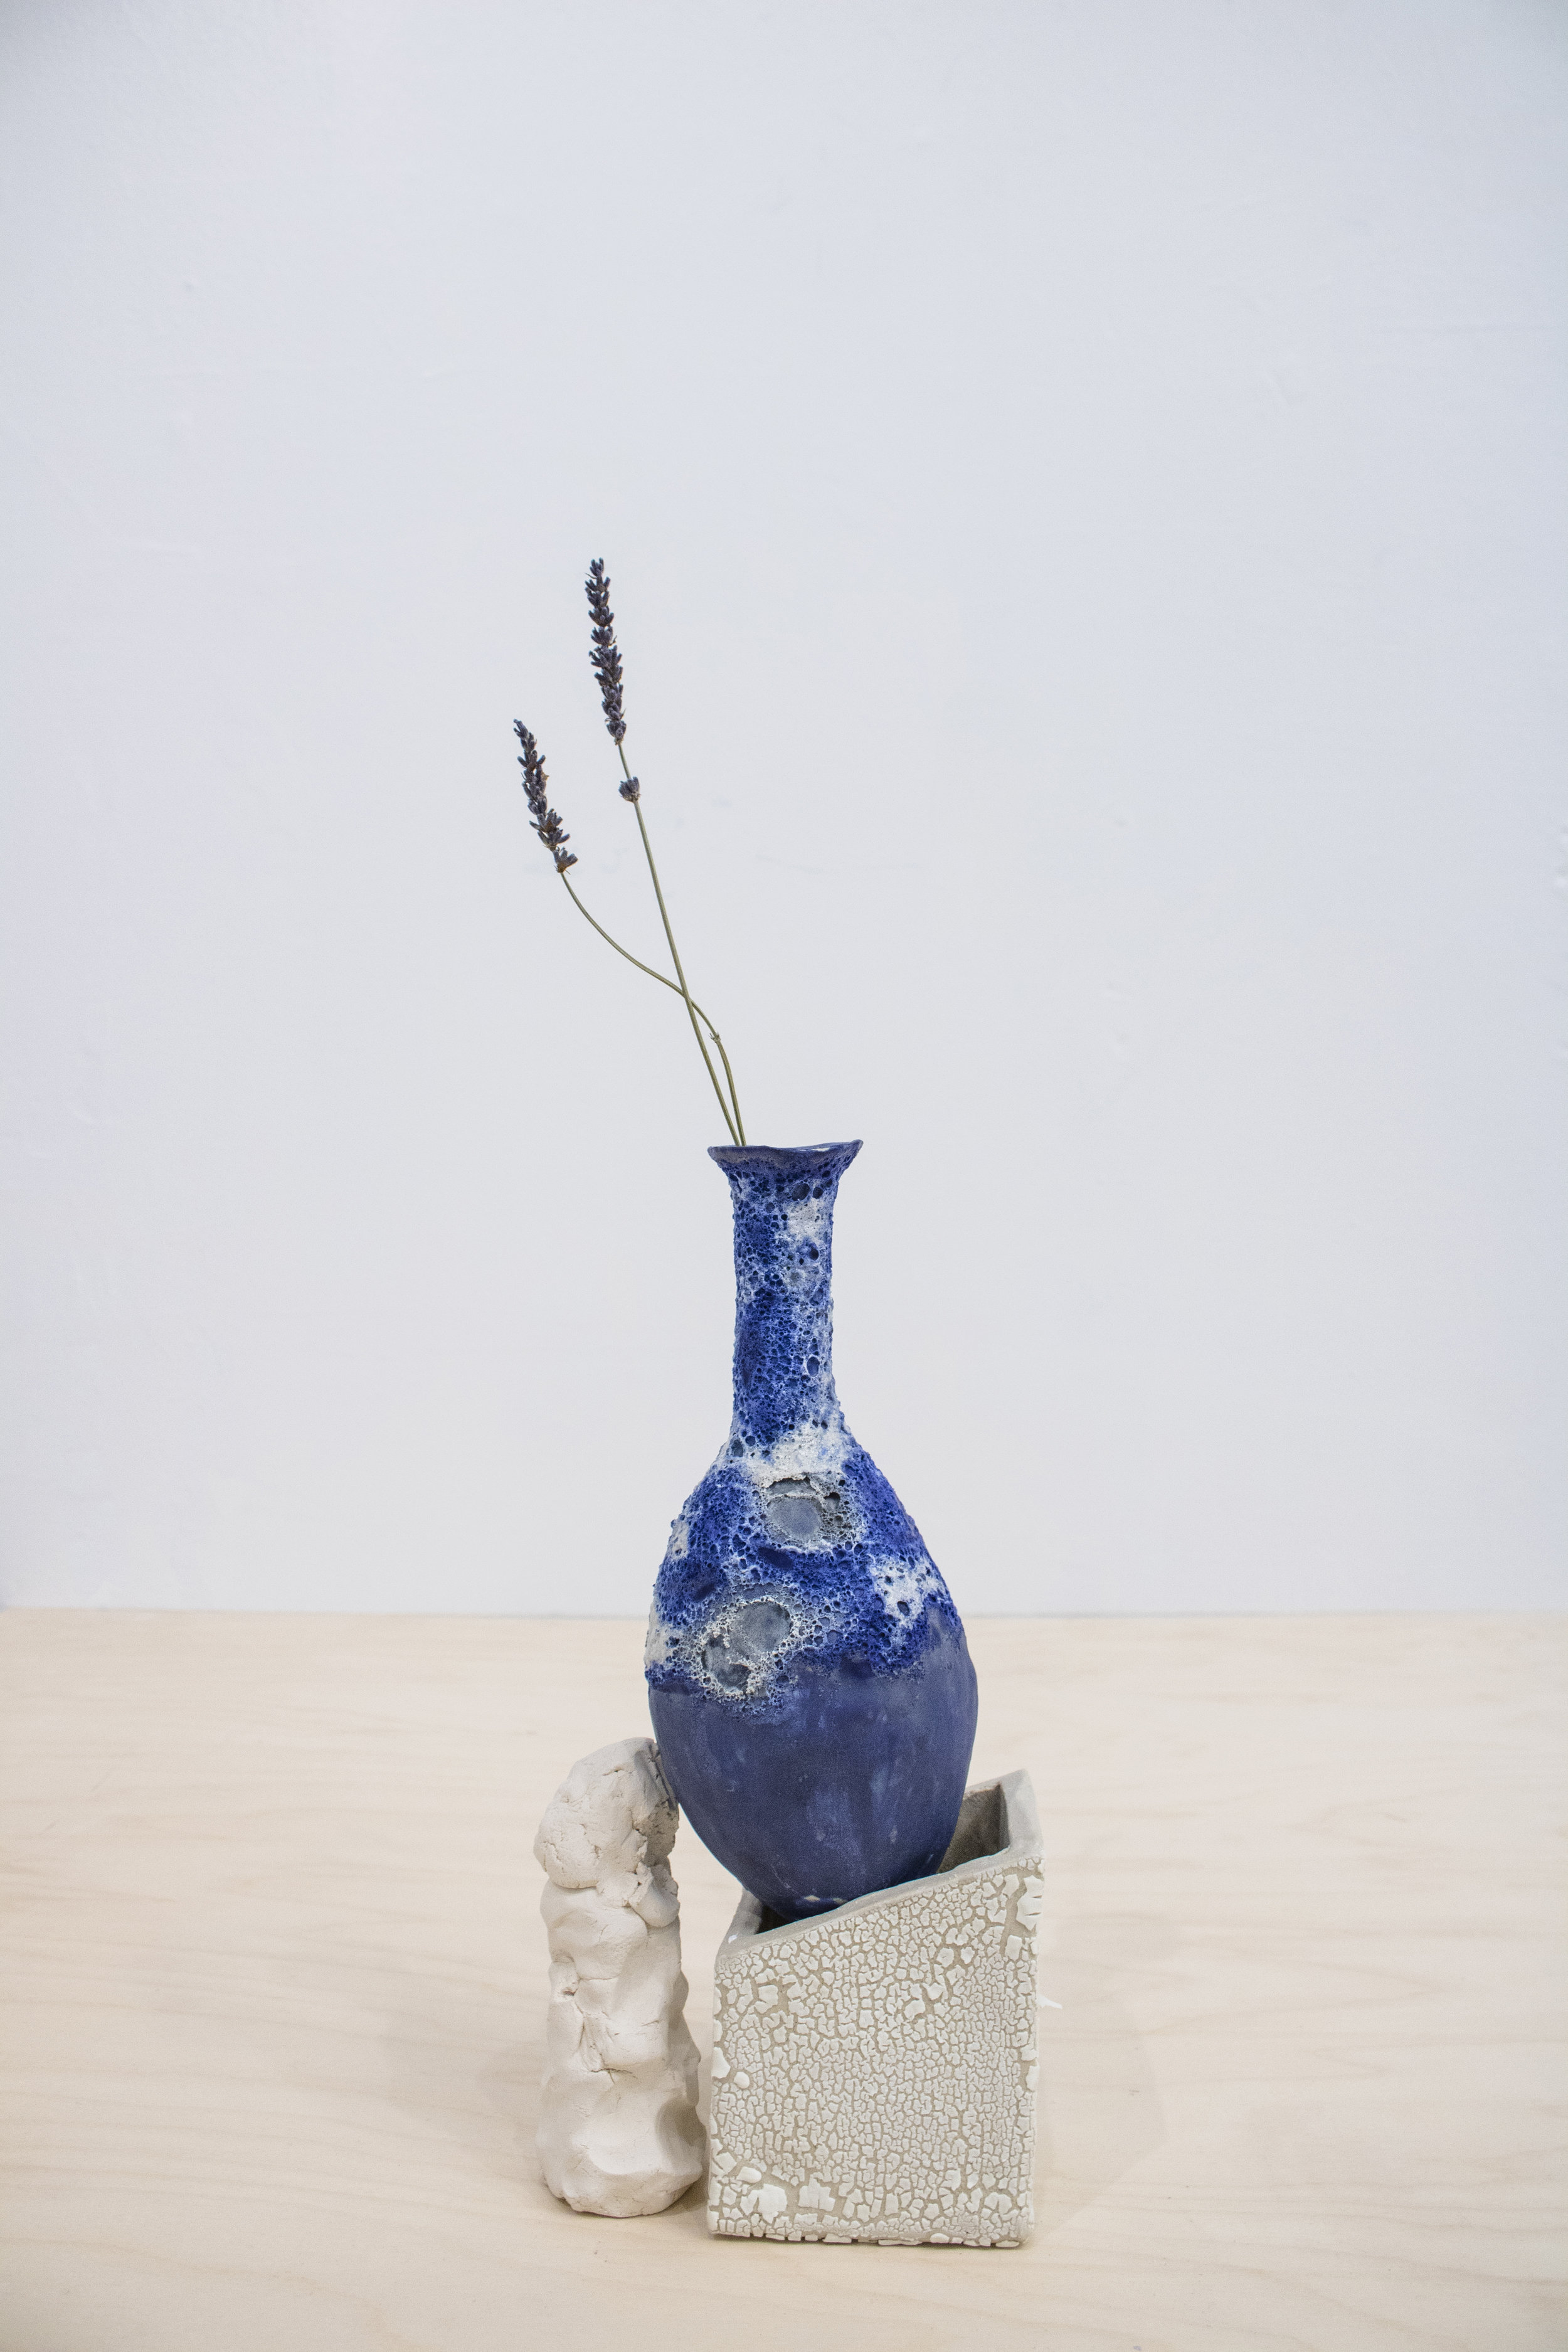 Bule Holder II, 2017, fired clay, glazed stoneware, lavendar